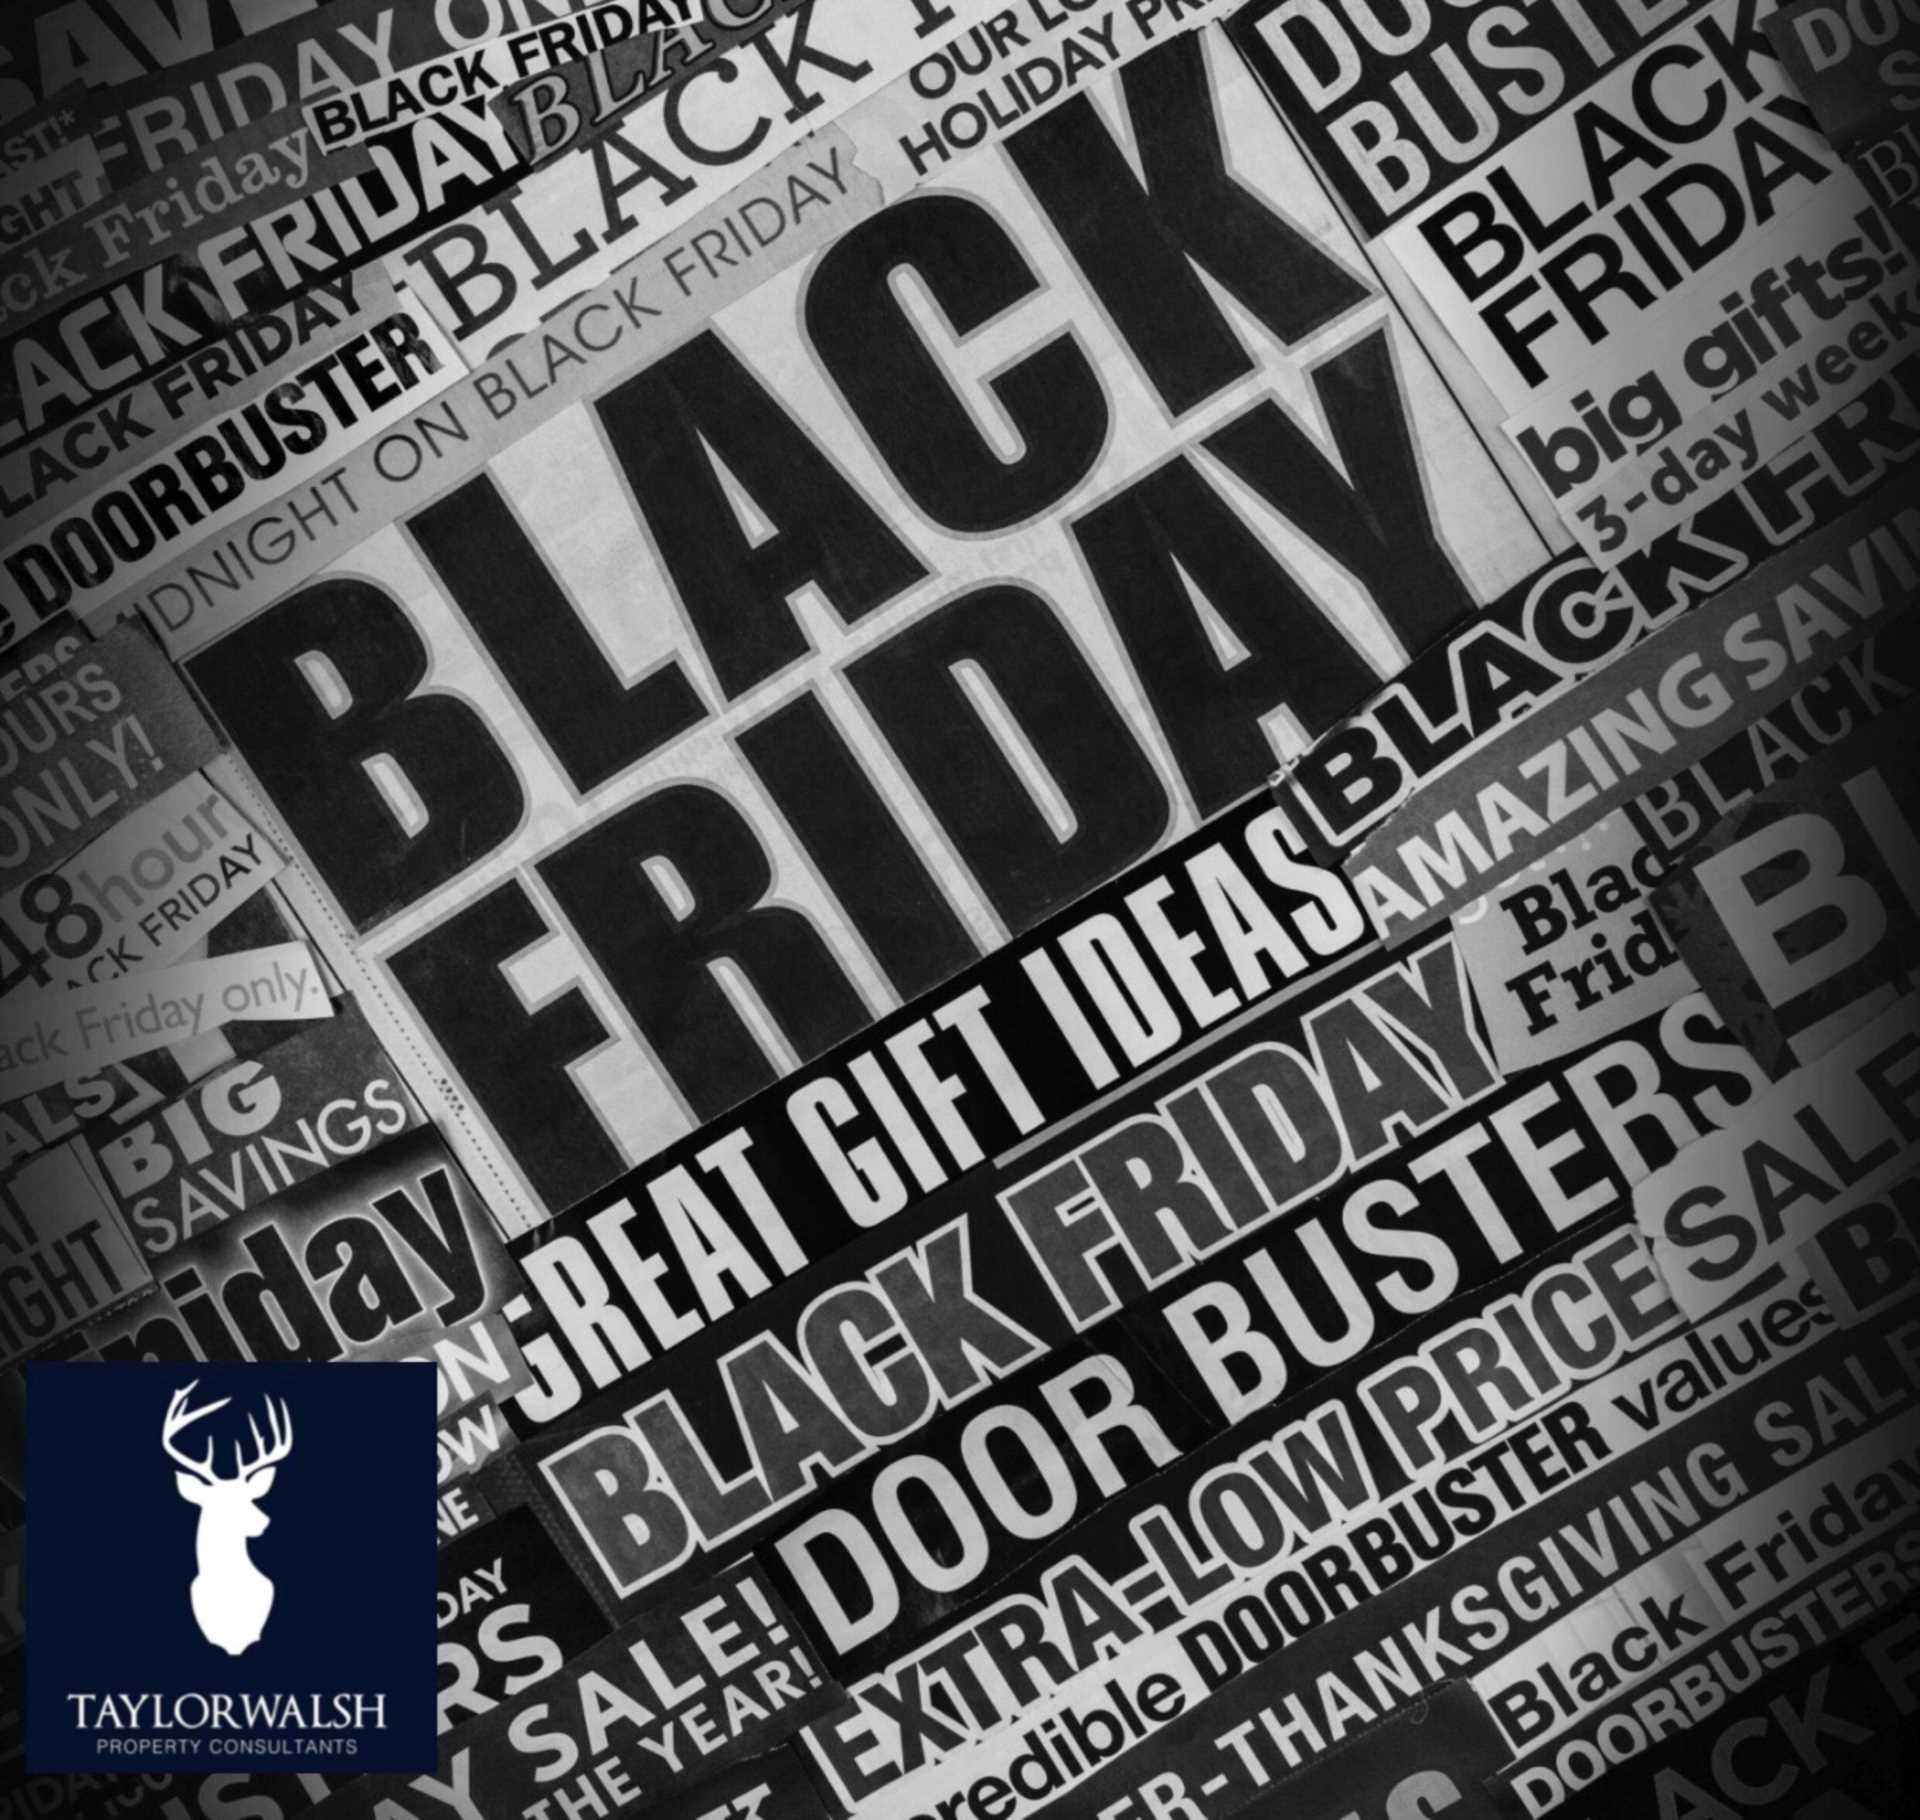 Black Friday? No Thanks!